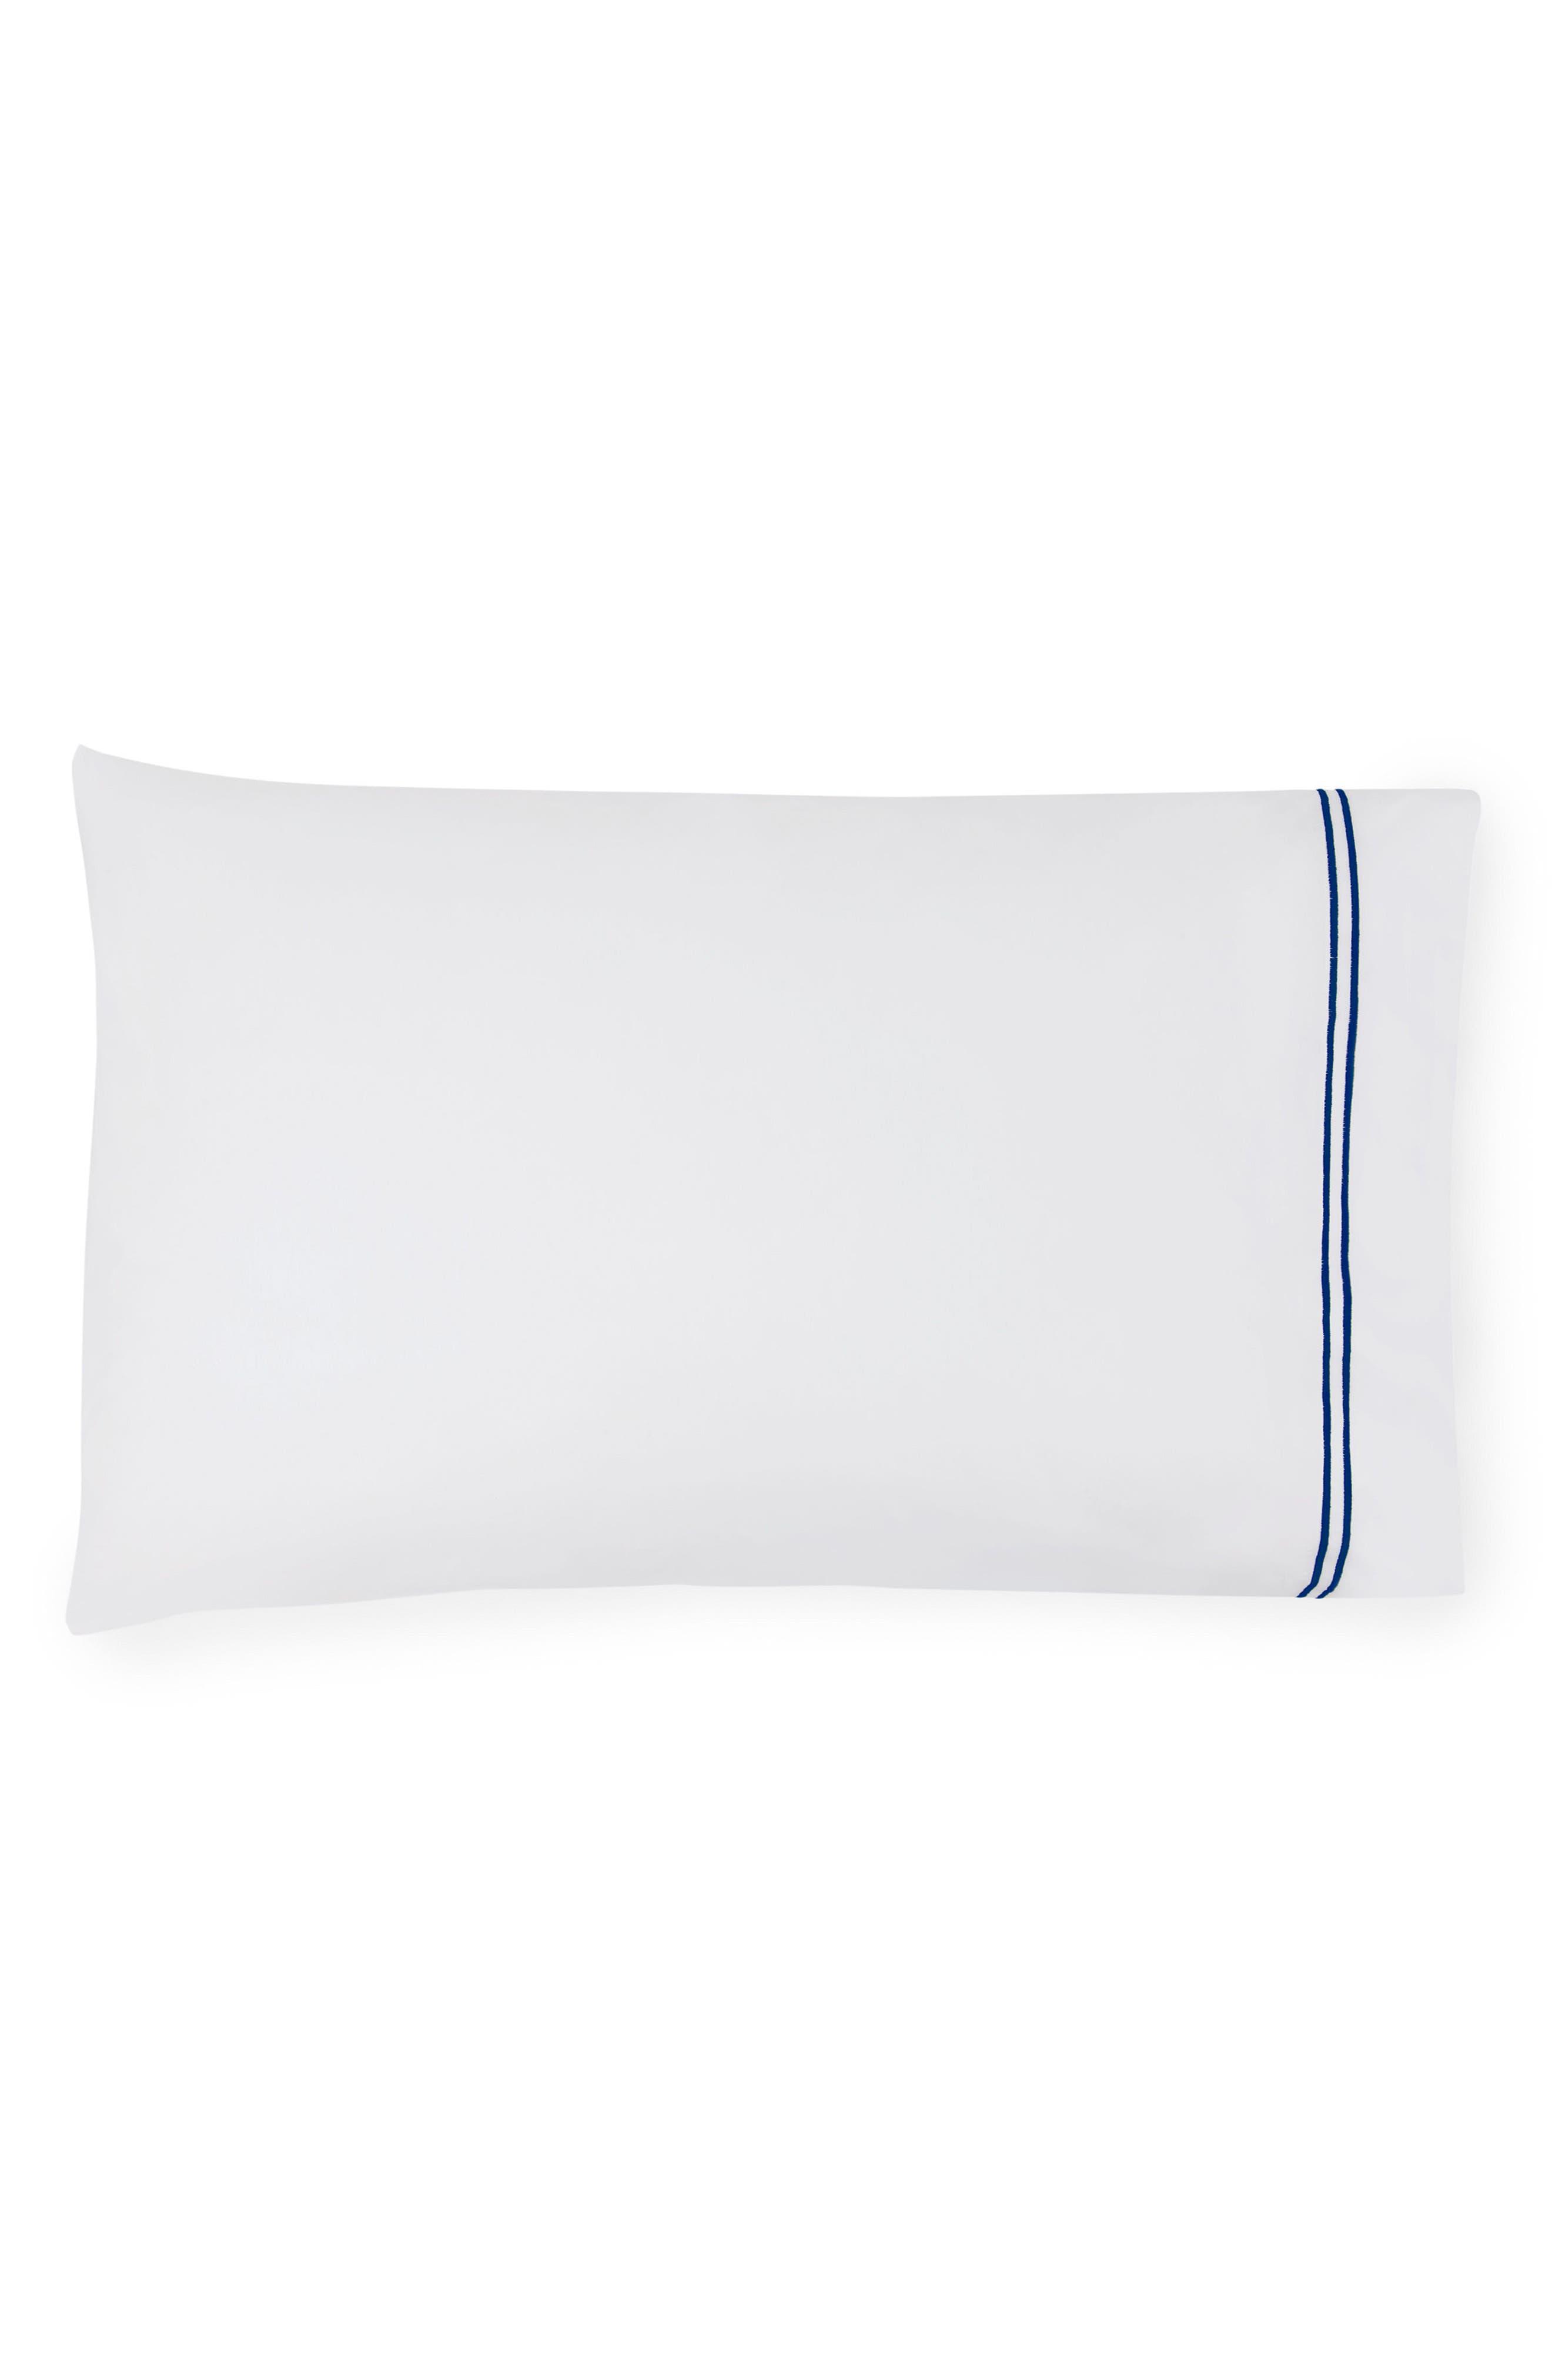 Grande Hotel Pillowcase,                             Main thumbnail 1, color,                             WHITE/ NAVY